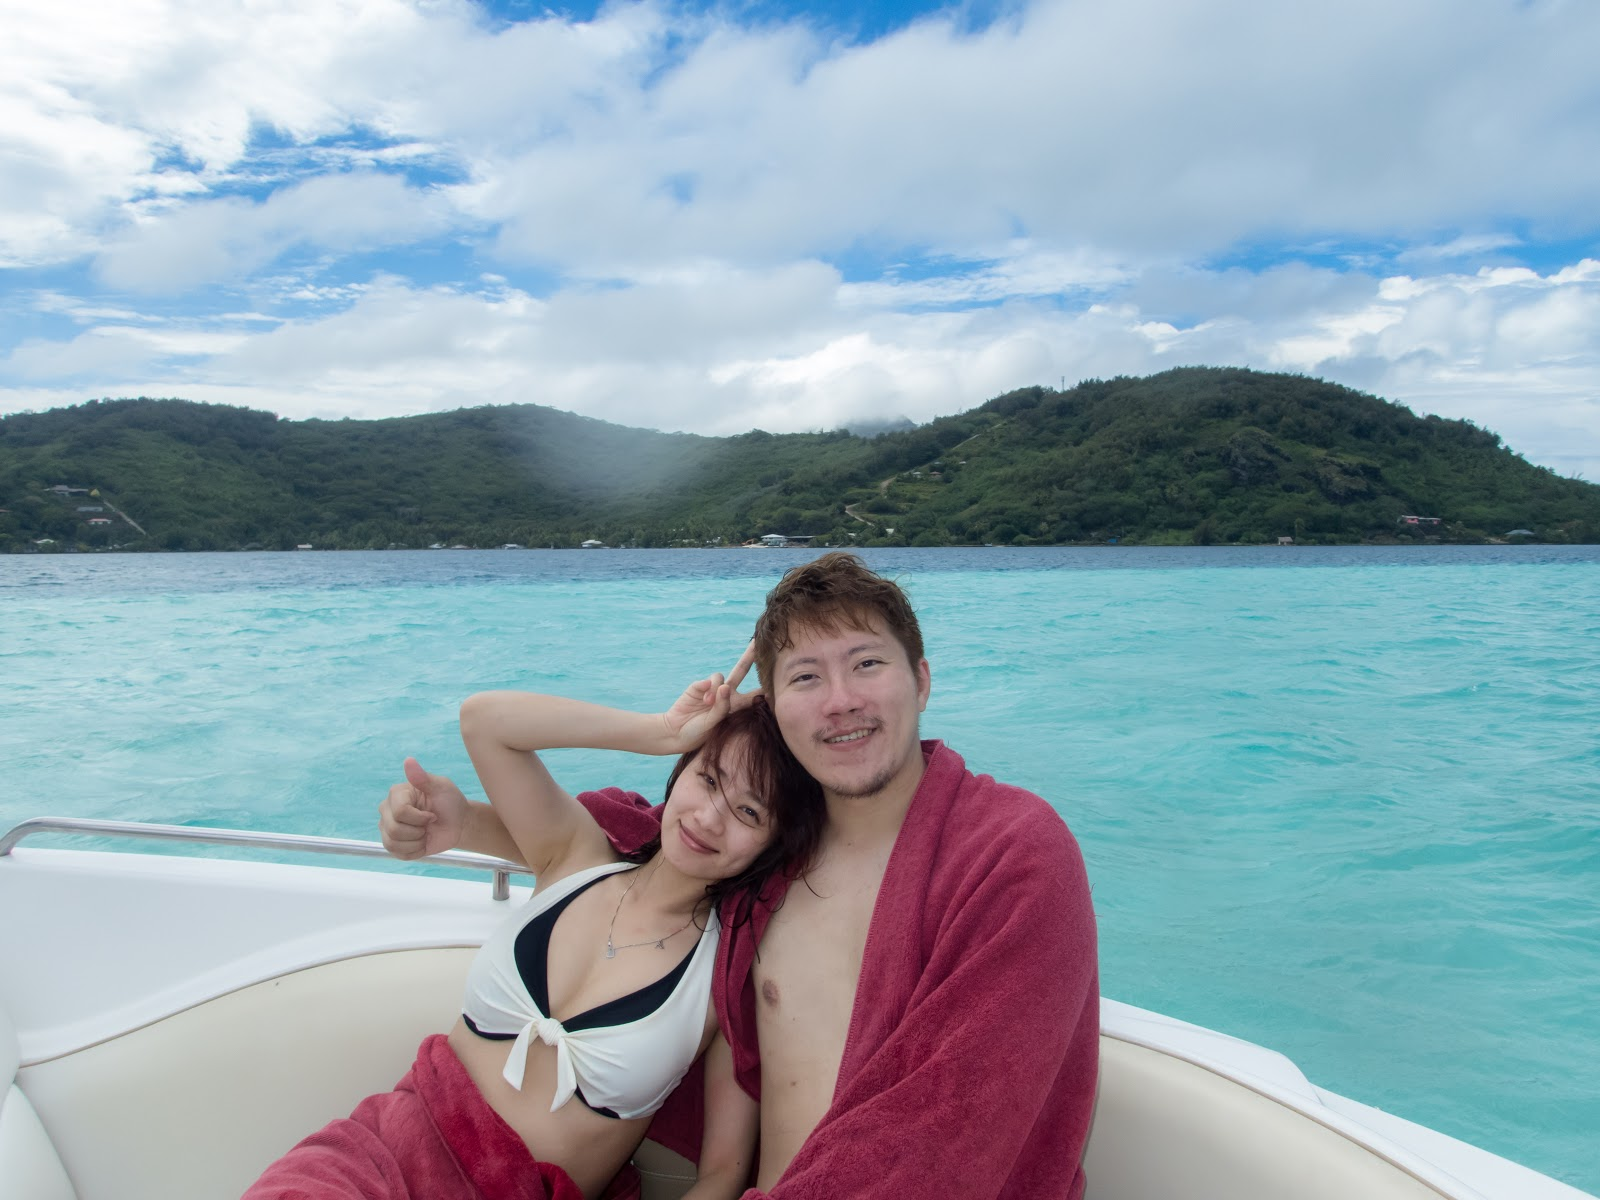 Tahiti Bora Bora|Pure Snorkeling @Aquarium Snorkeling Location. Manta ray